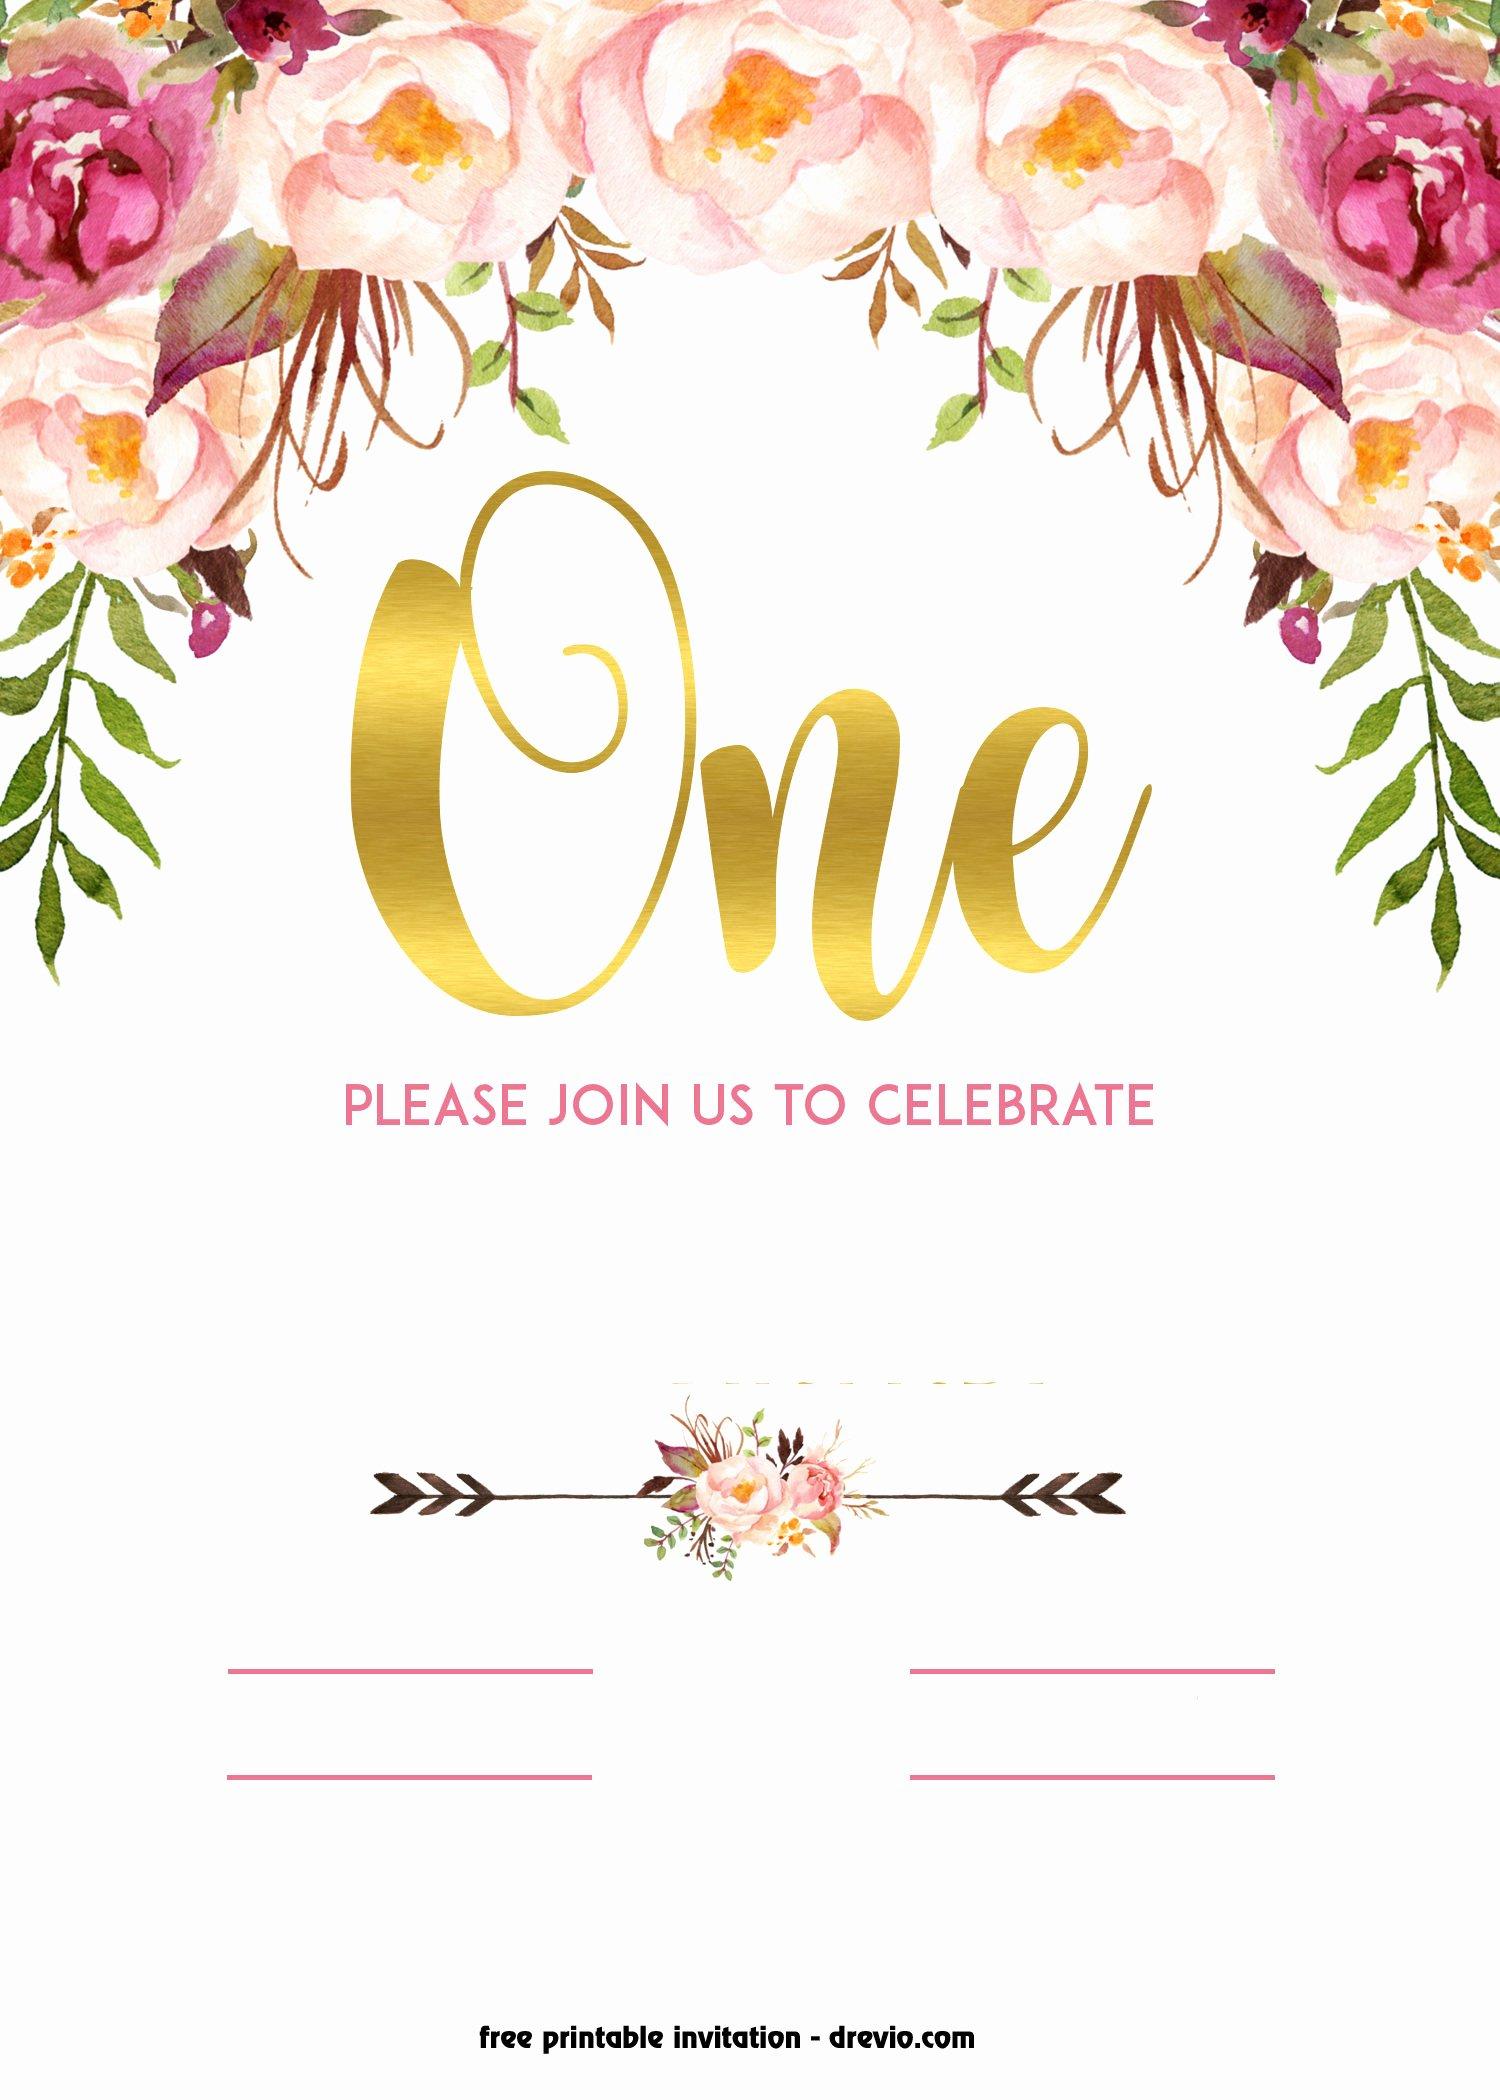 Free Printable Birthday Invitation Templates Beautiful Free Printable 1st Birthday Invitation – Vintage Style